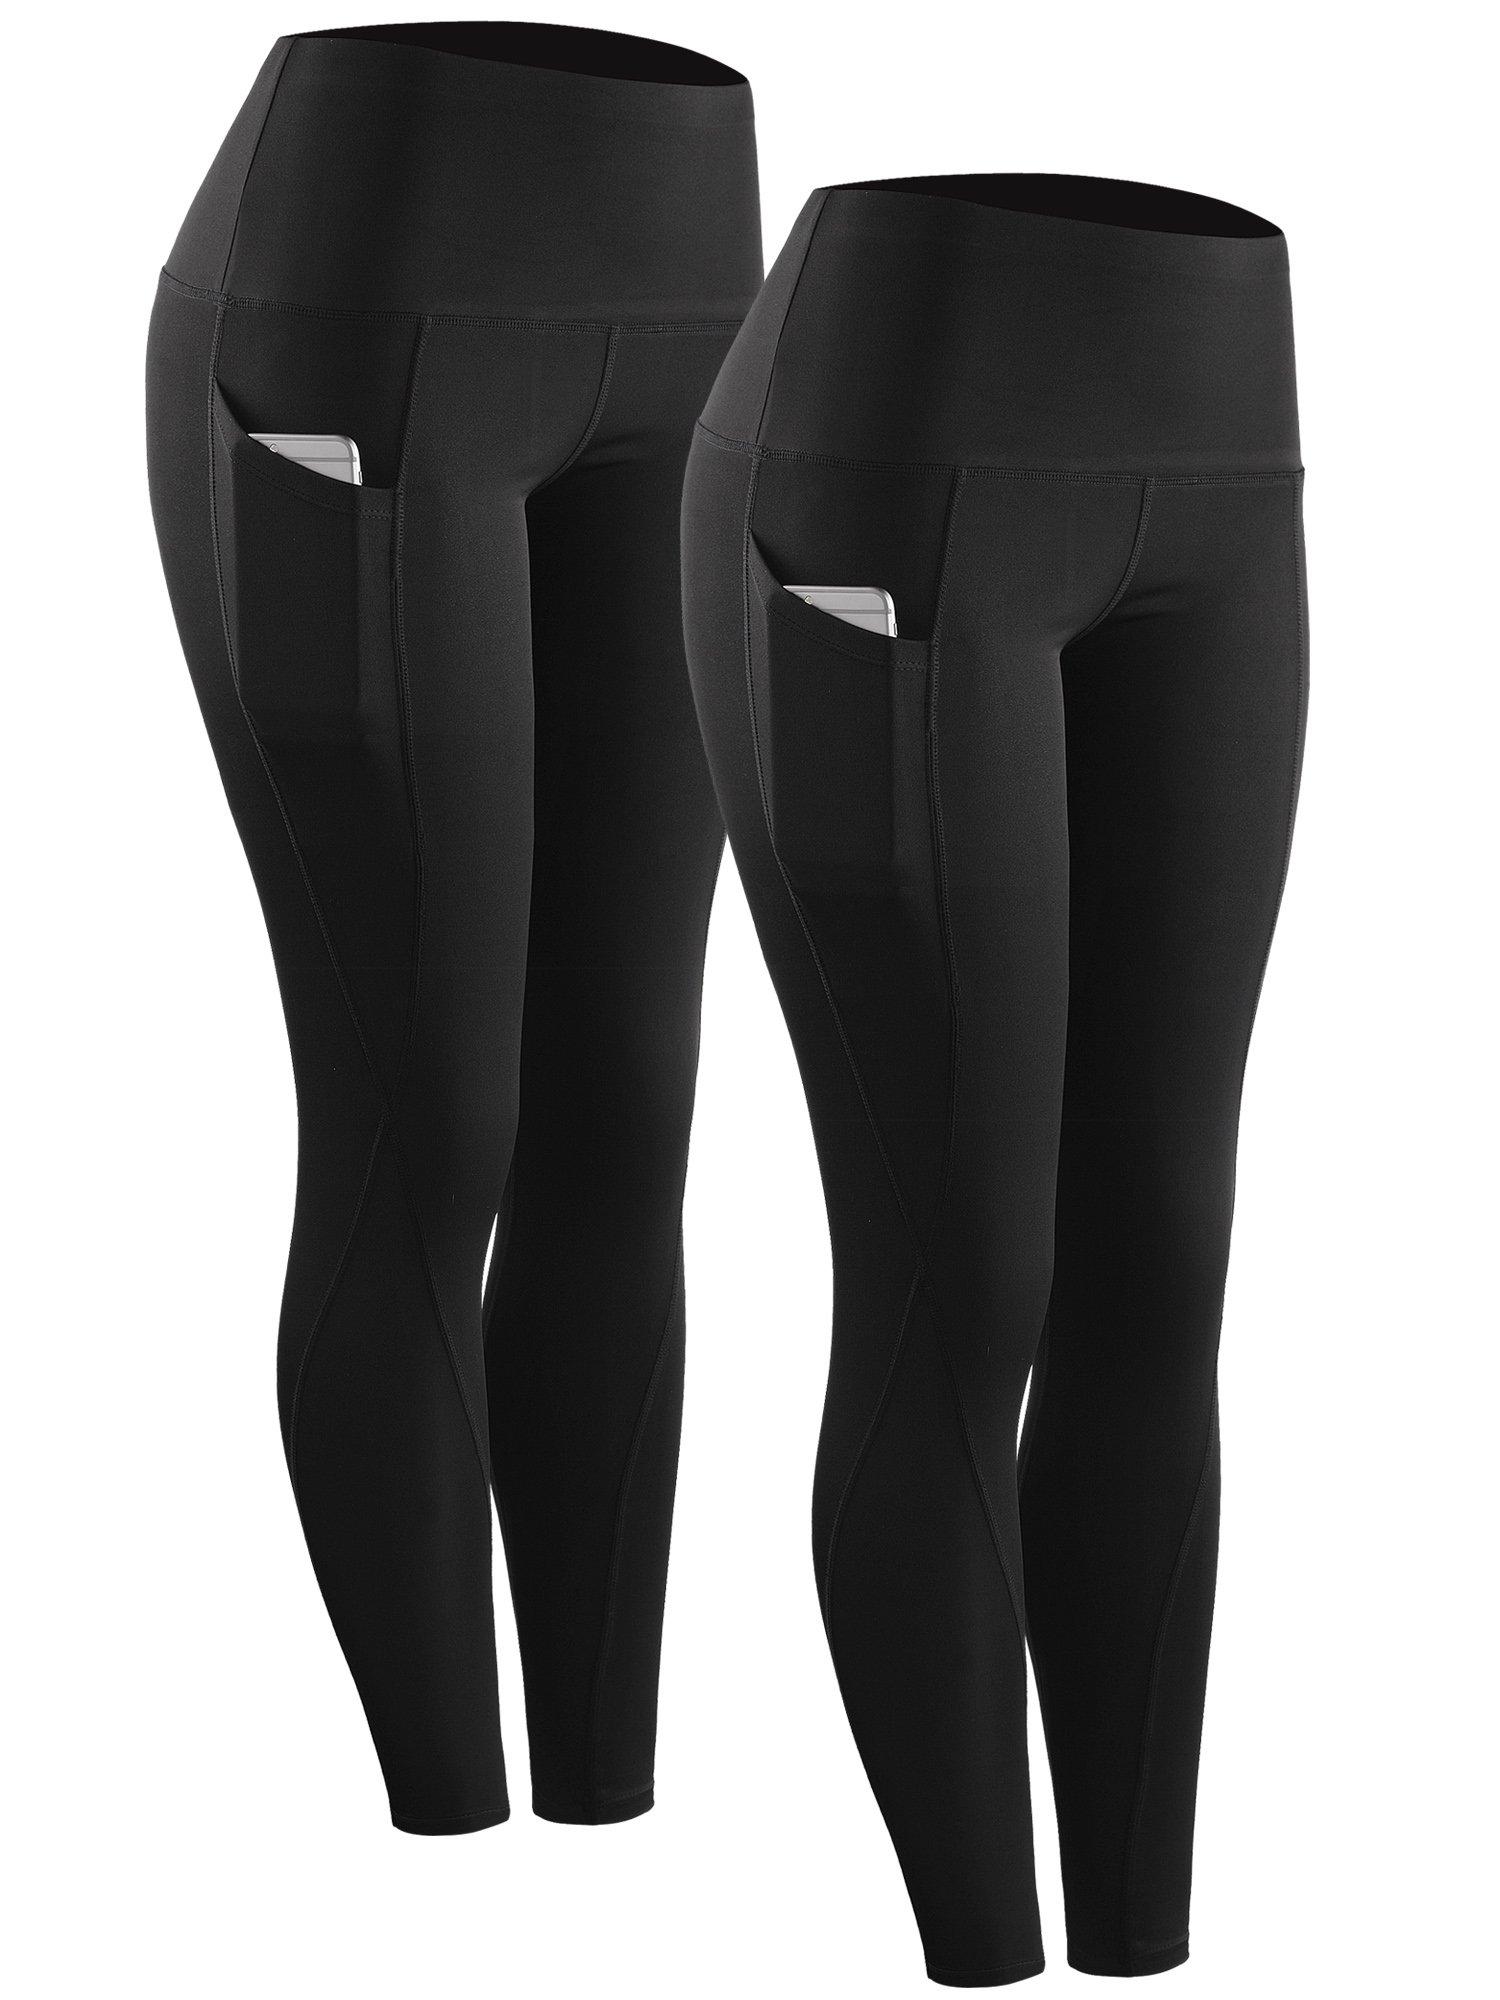 Neleus 2 Pack Tummy Control High Waist Running Workout Leggings,9017,2 Pack,Black,US S,EU M by Neleus